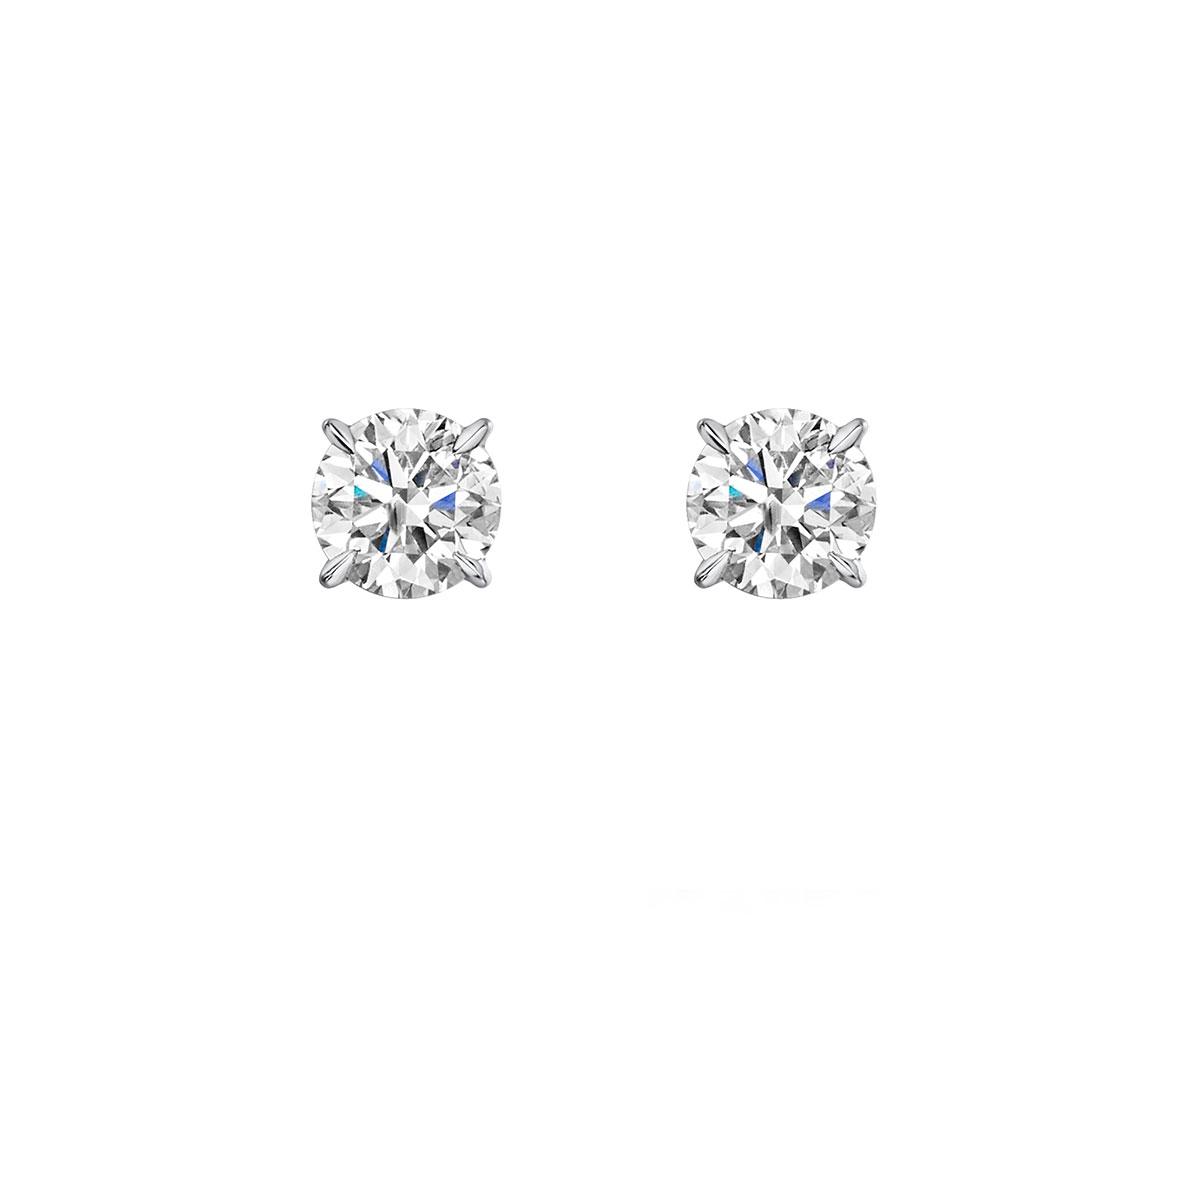 ROX Honour Diamond Earrings in Platinum